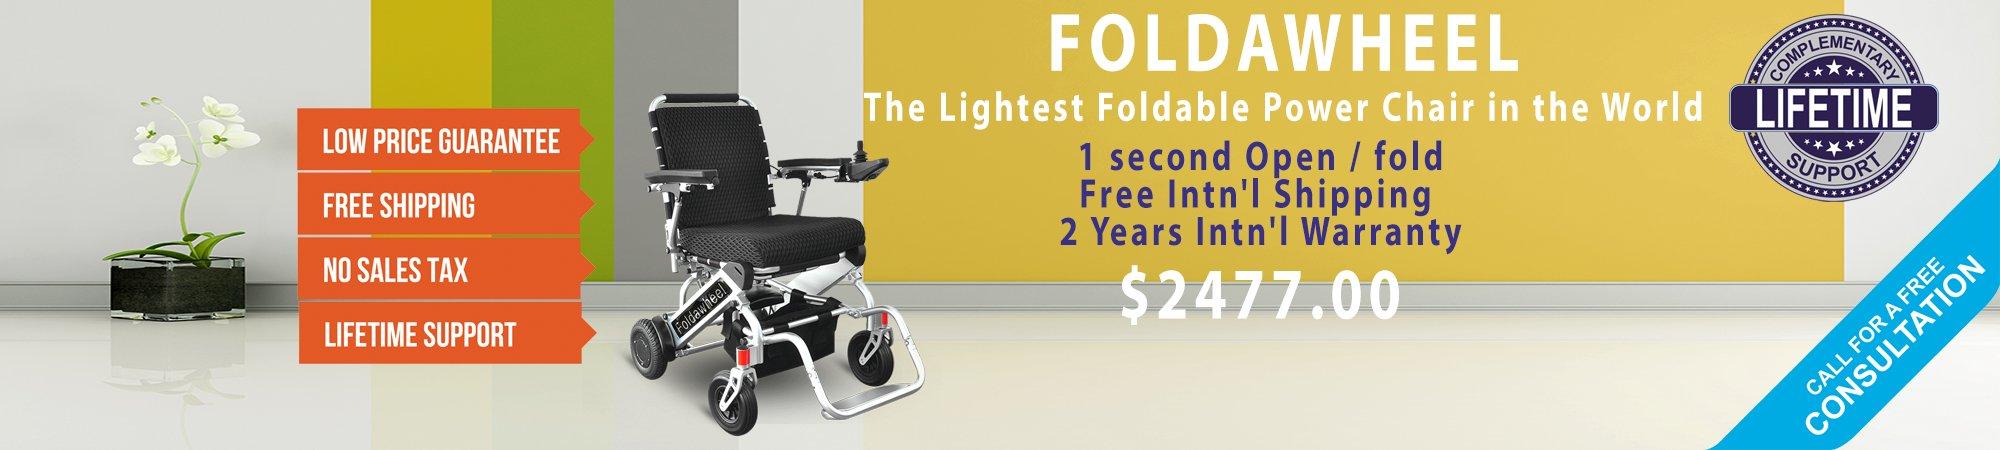 Foldawheel folding power chair